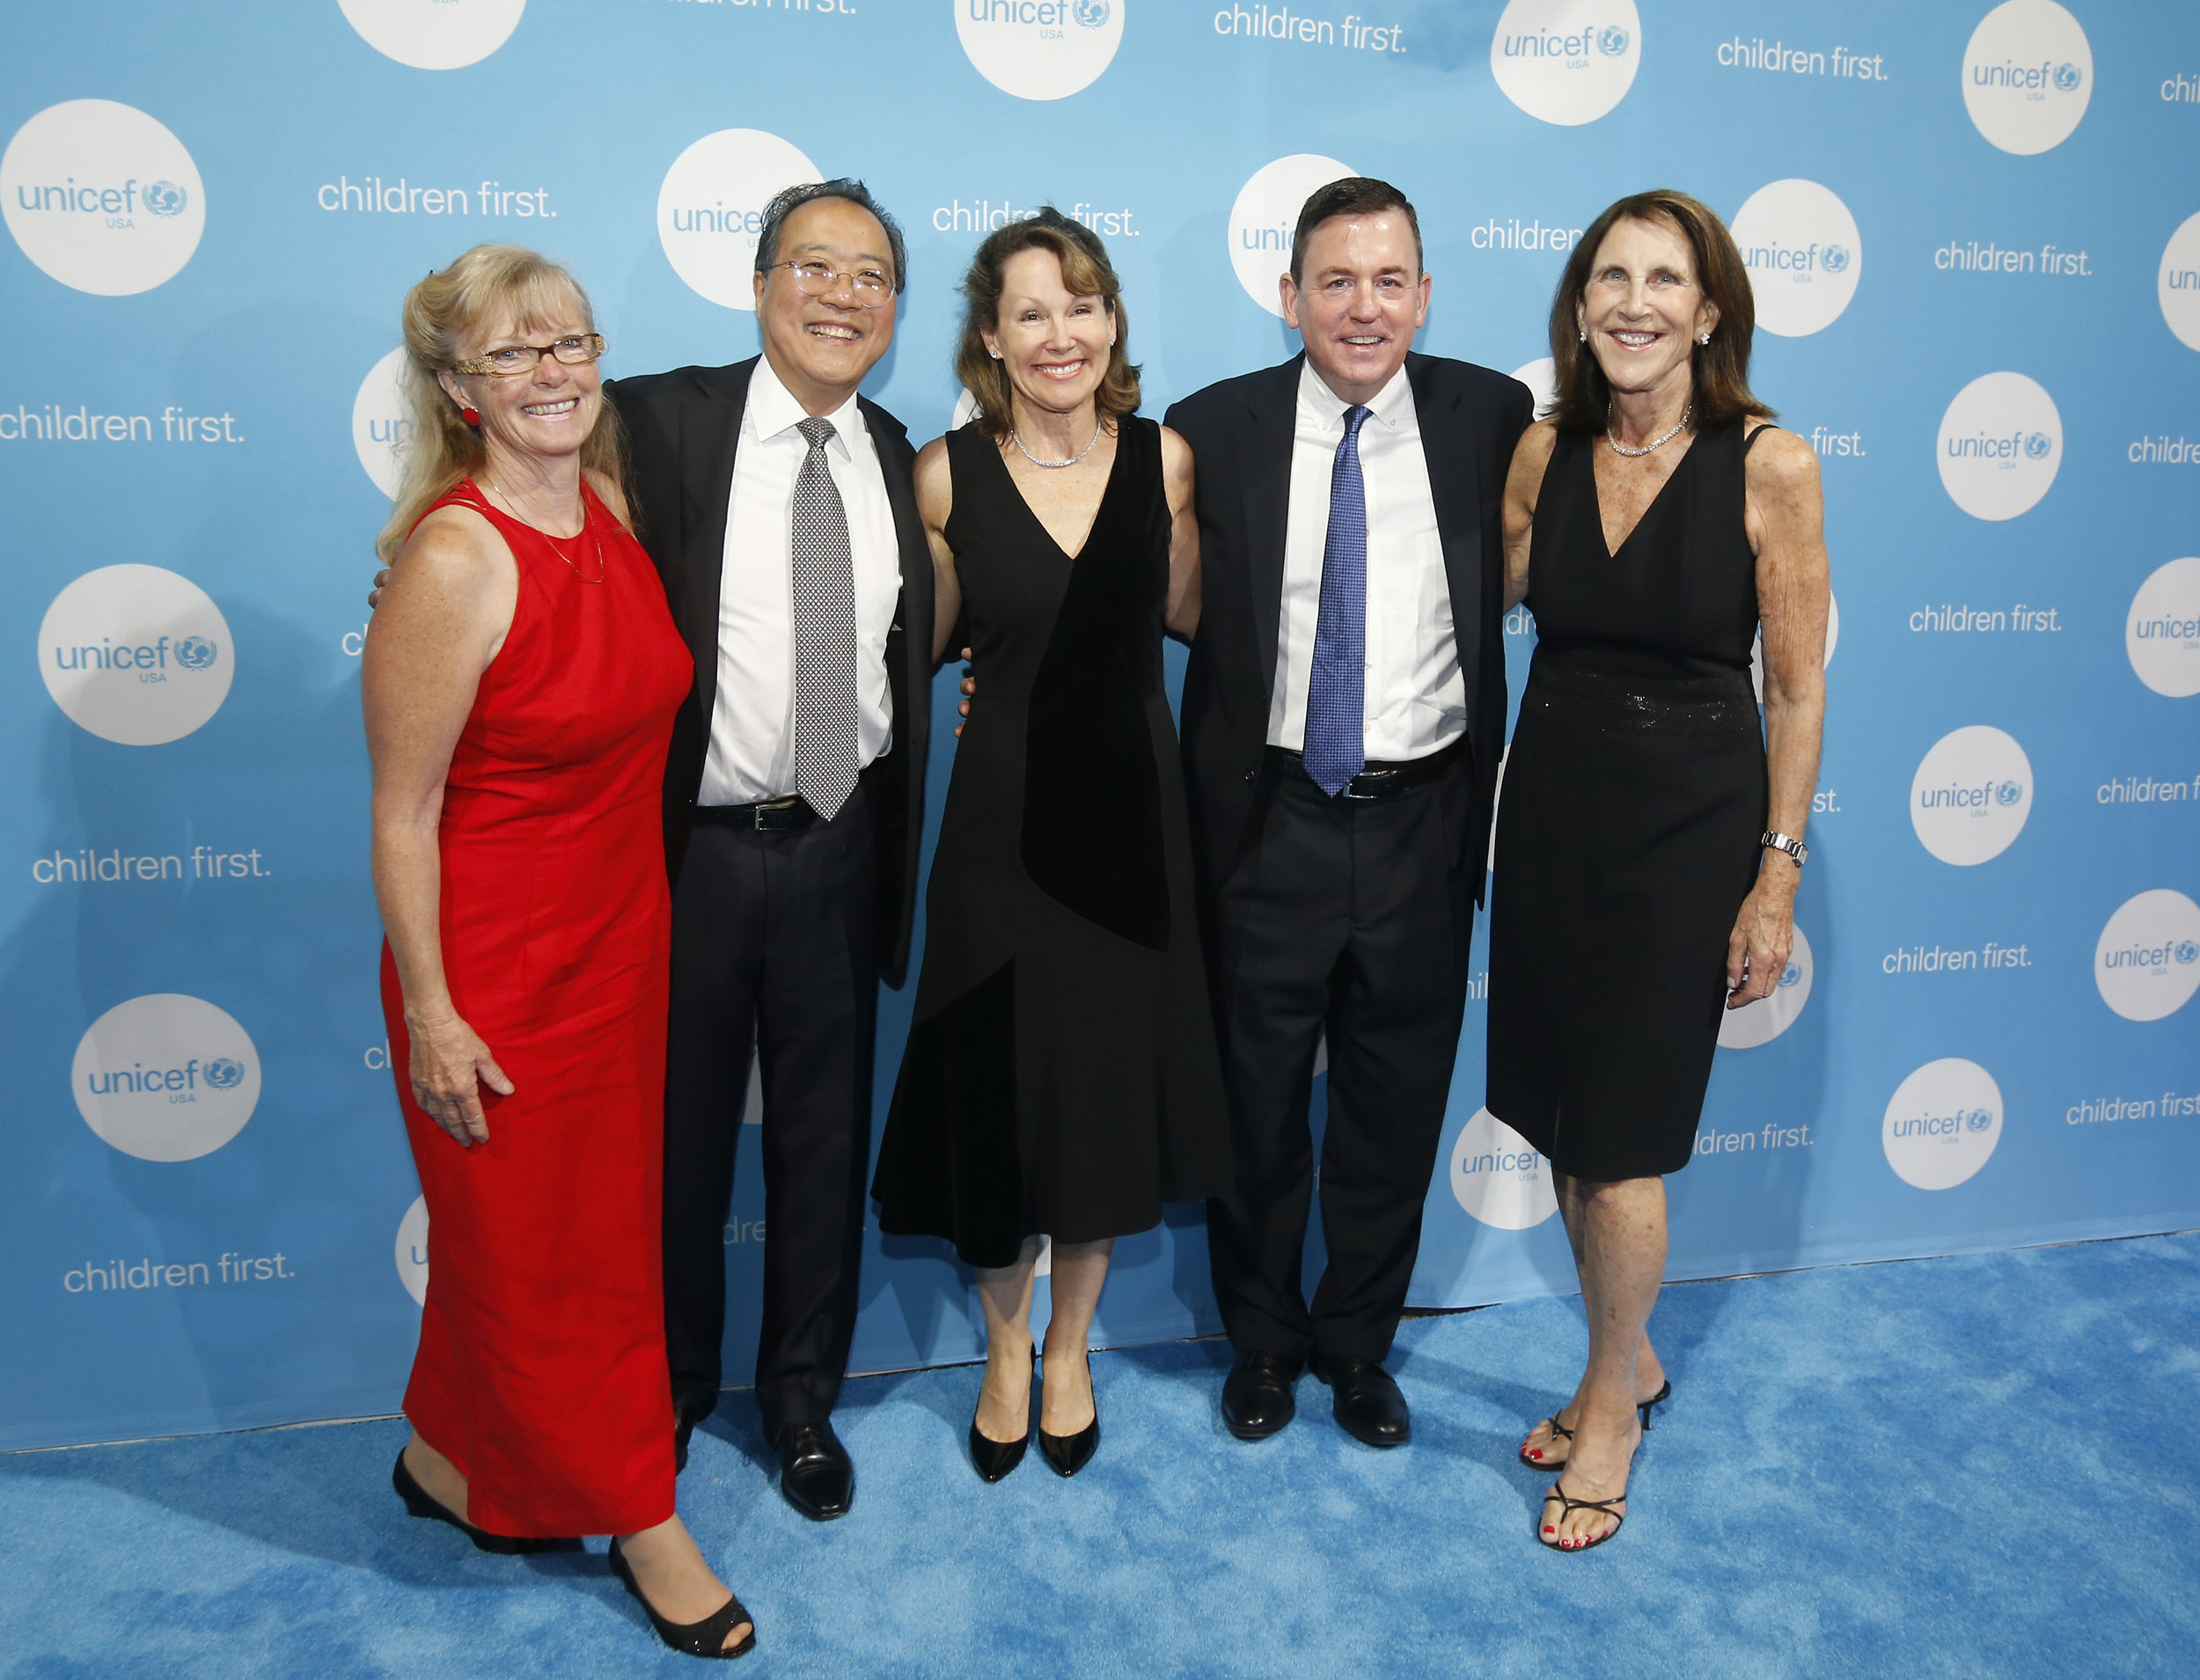 Willow Shire, Yo-Yo Ma, Barbara Eisenson, Barron Segar and Barrie Landry at the 2017 UNICEF Children's Champion Award Dinner.  © Michael Blanchard Photography